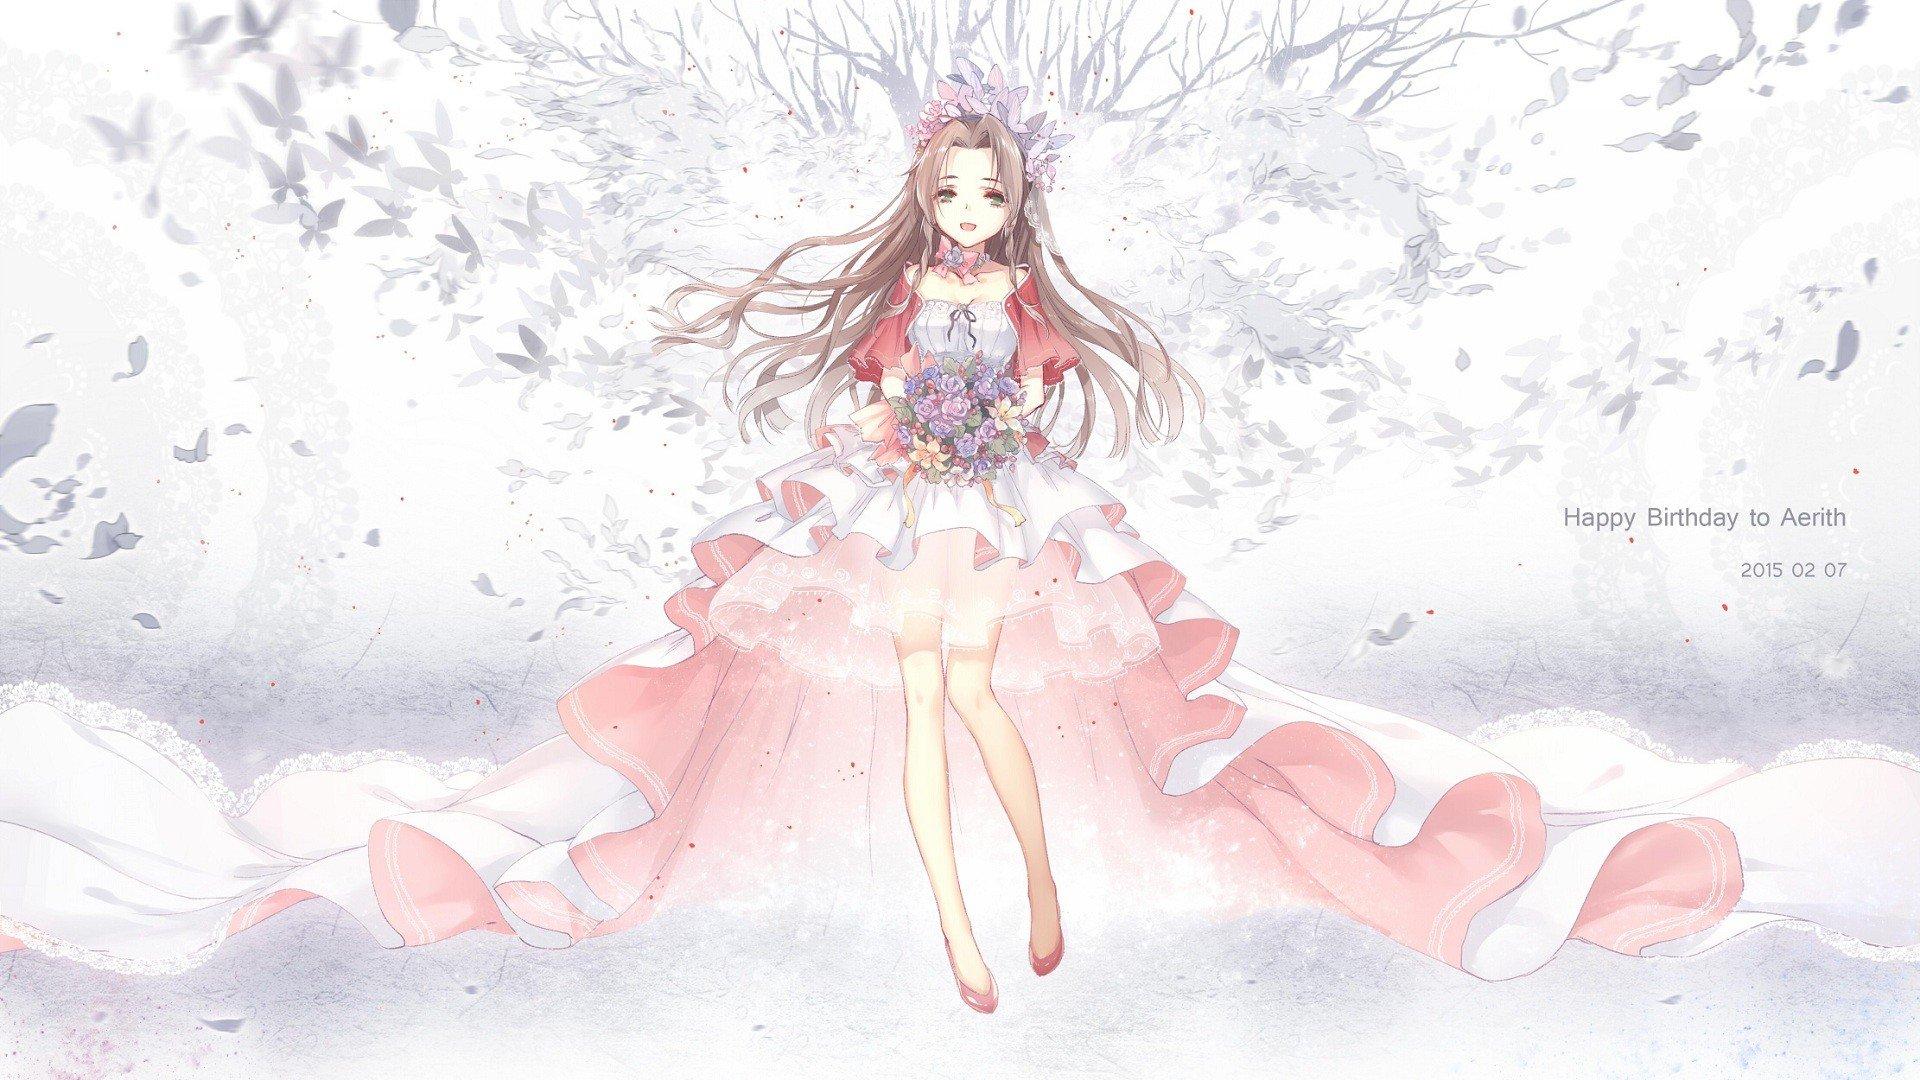 Unduh 46 Wallpaper Final Fantasy Aerith HD Gratid